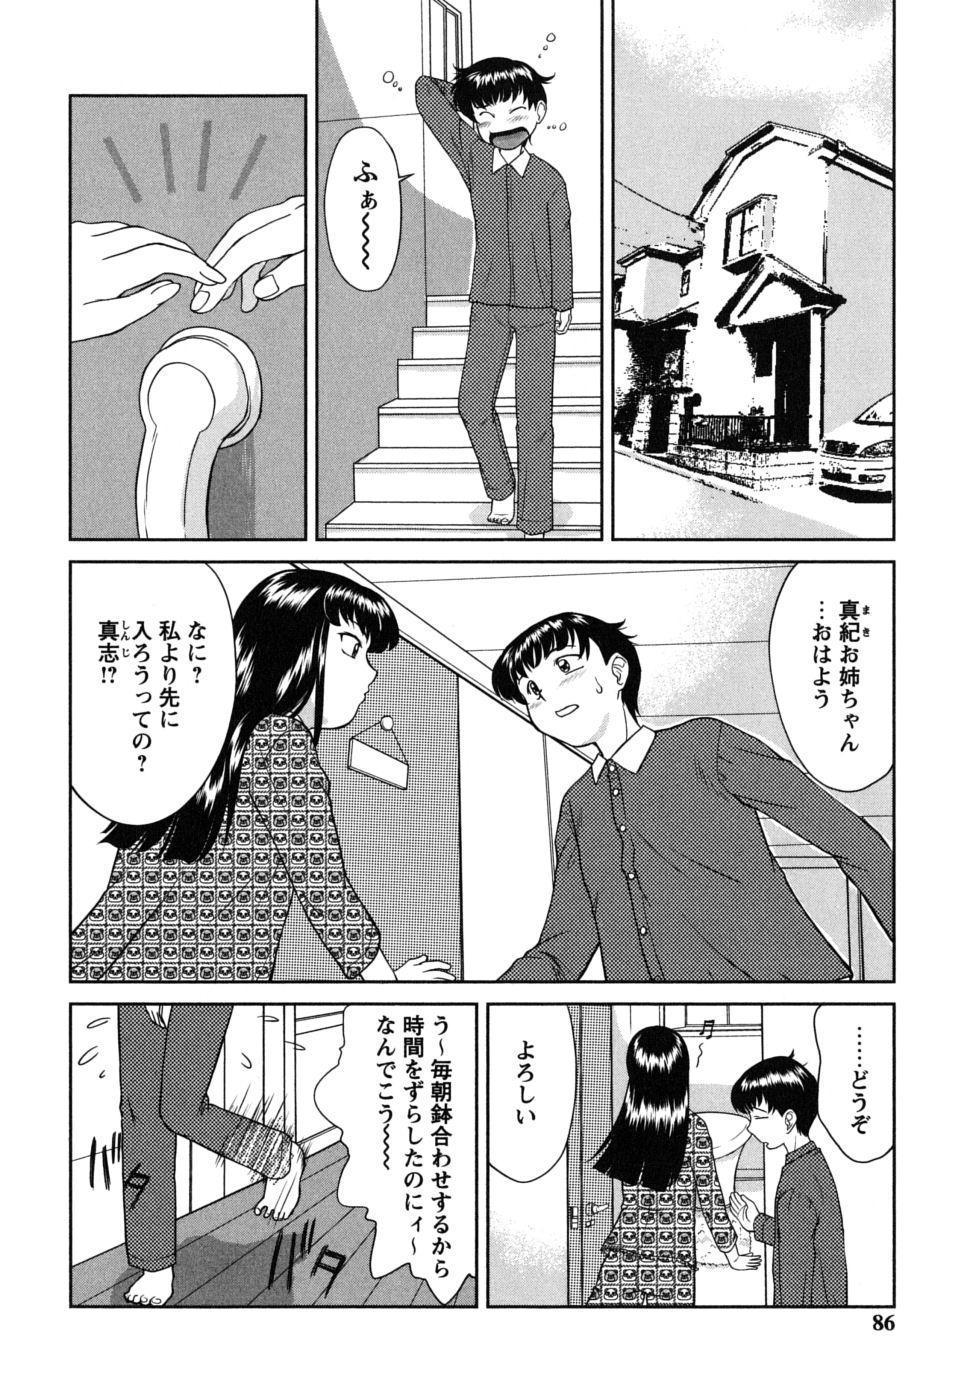 Futa Go Ecchi 85